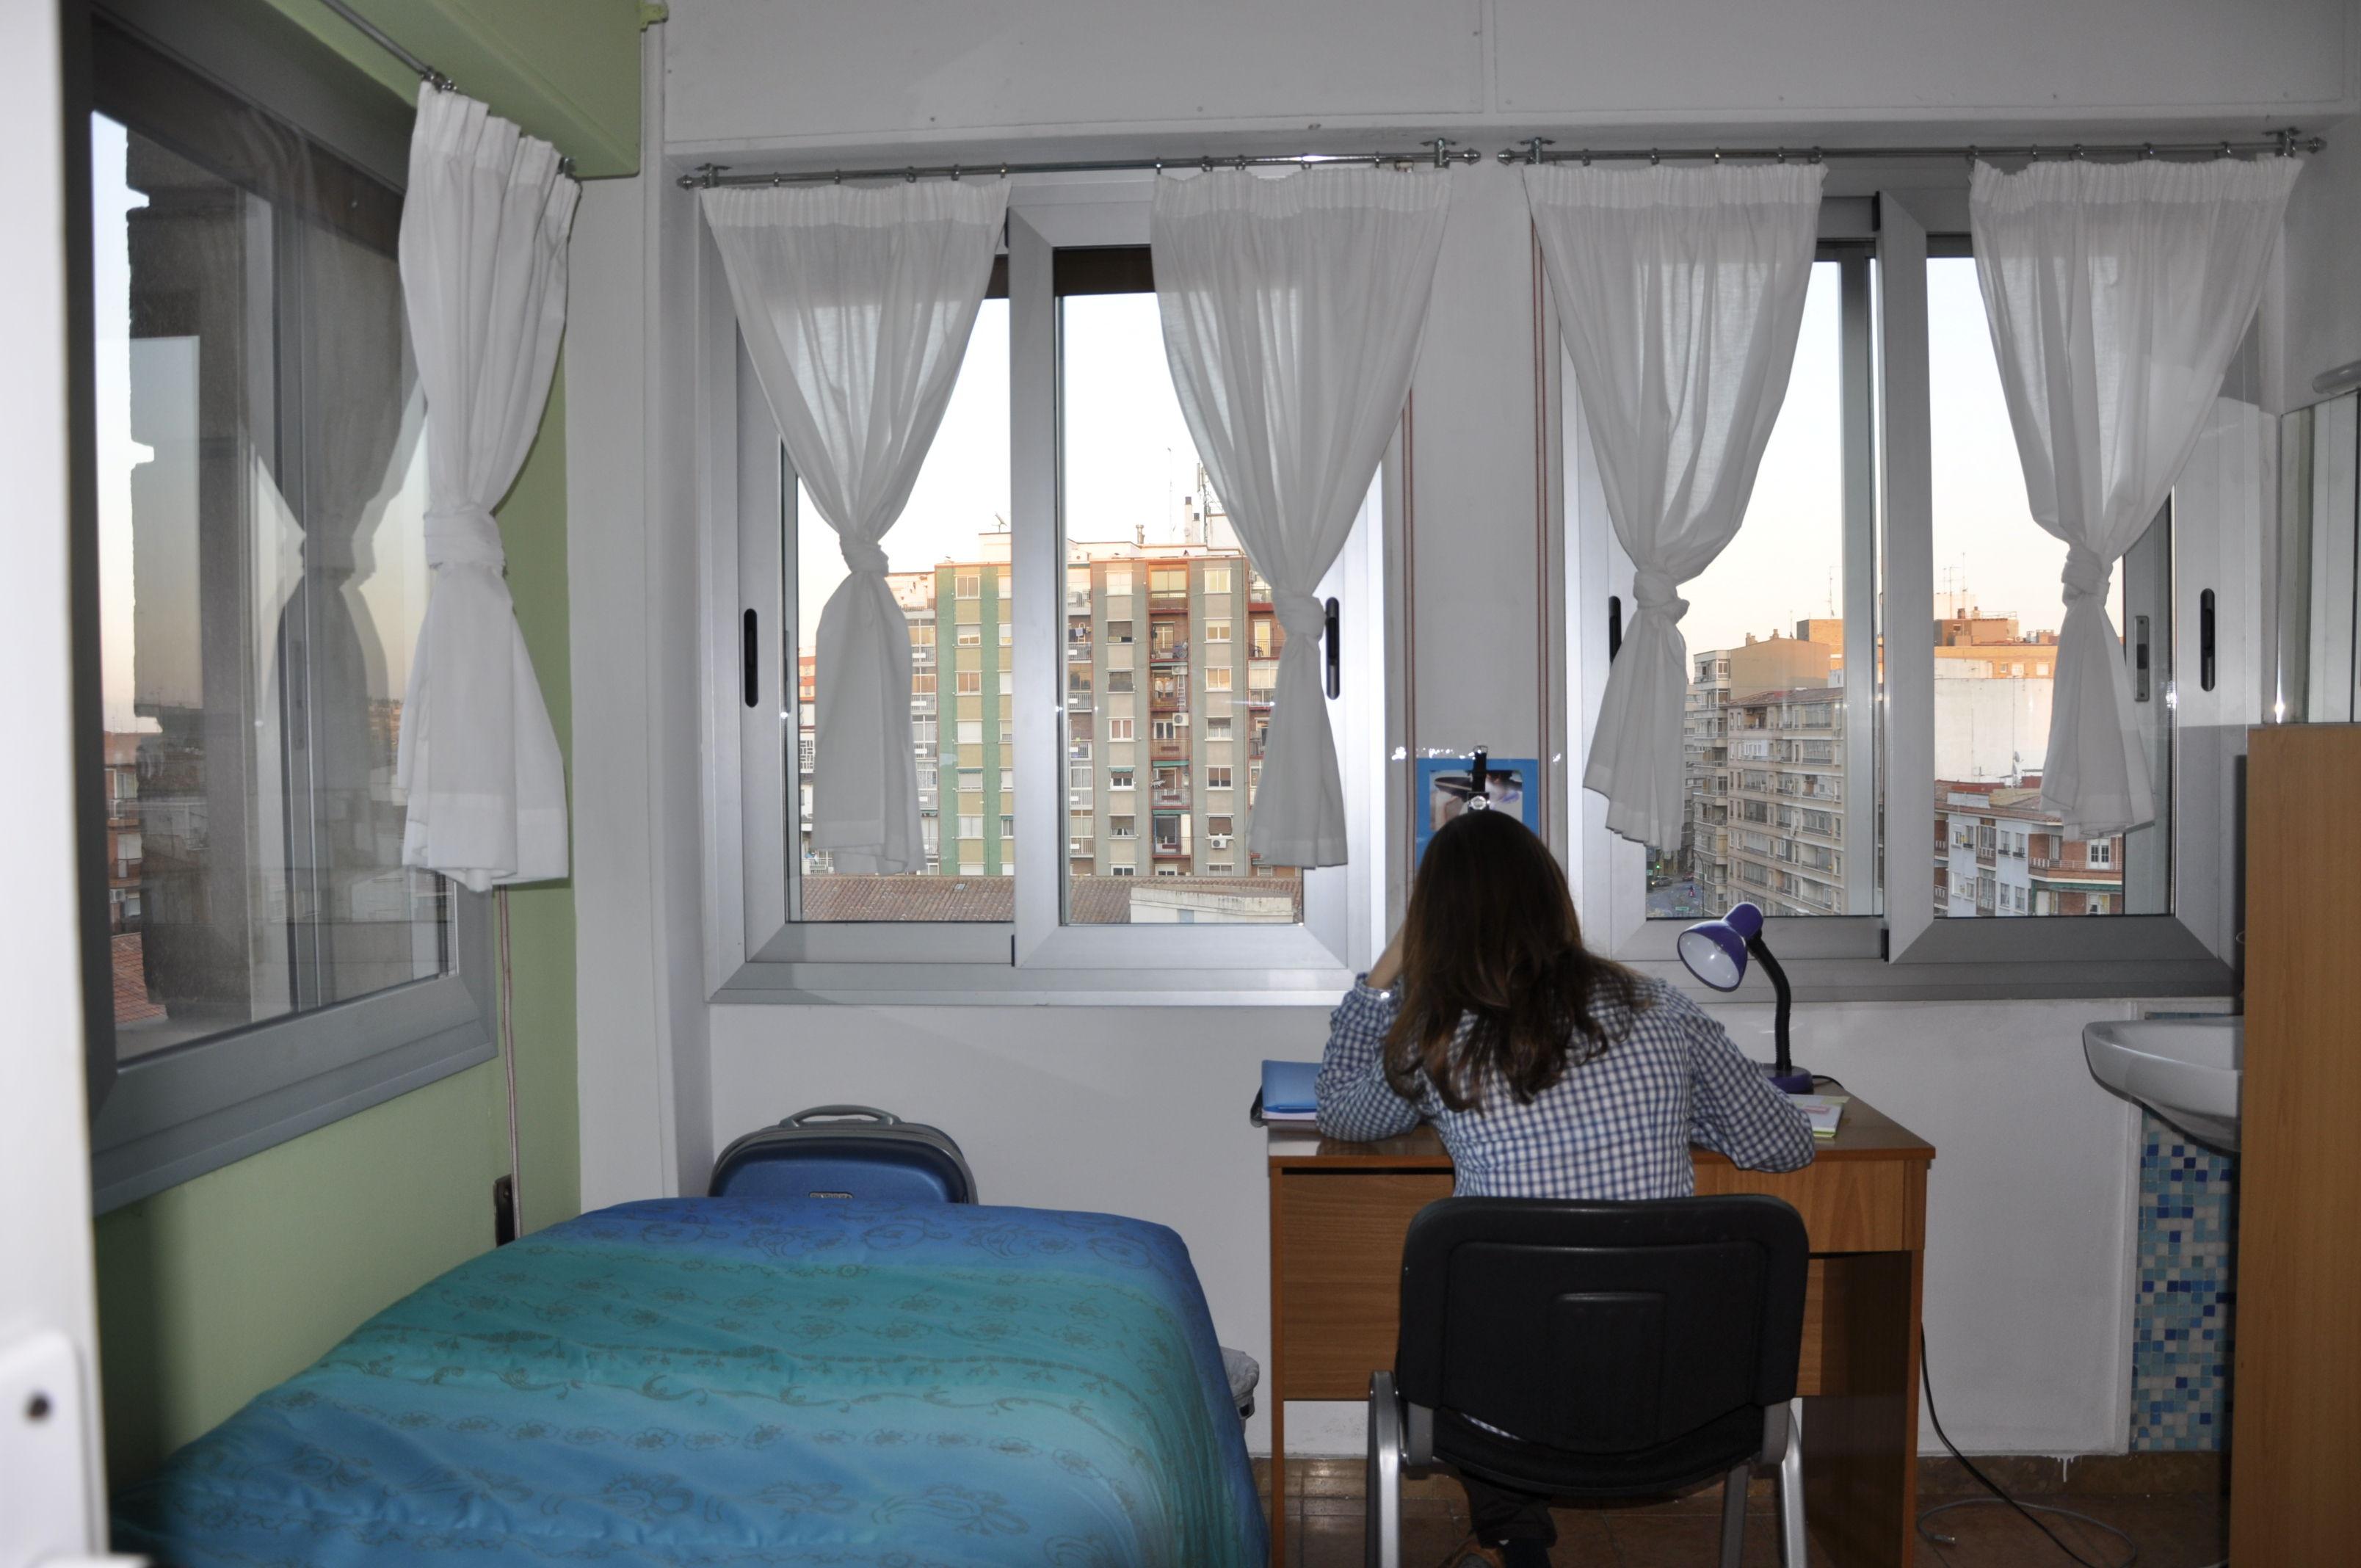 Foto 4 de Residencias de estudiantes en Zaragoza | Colegio Mayor Universitario Josefa Segovia